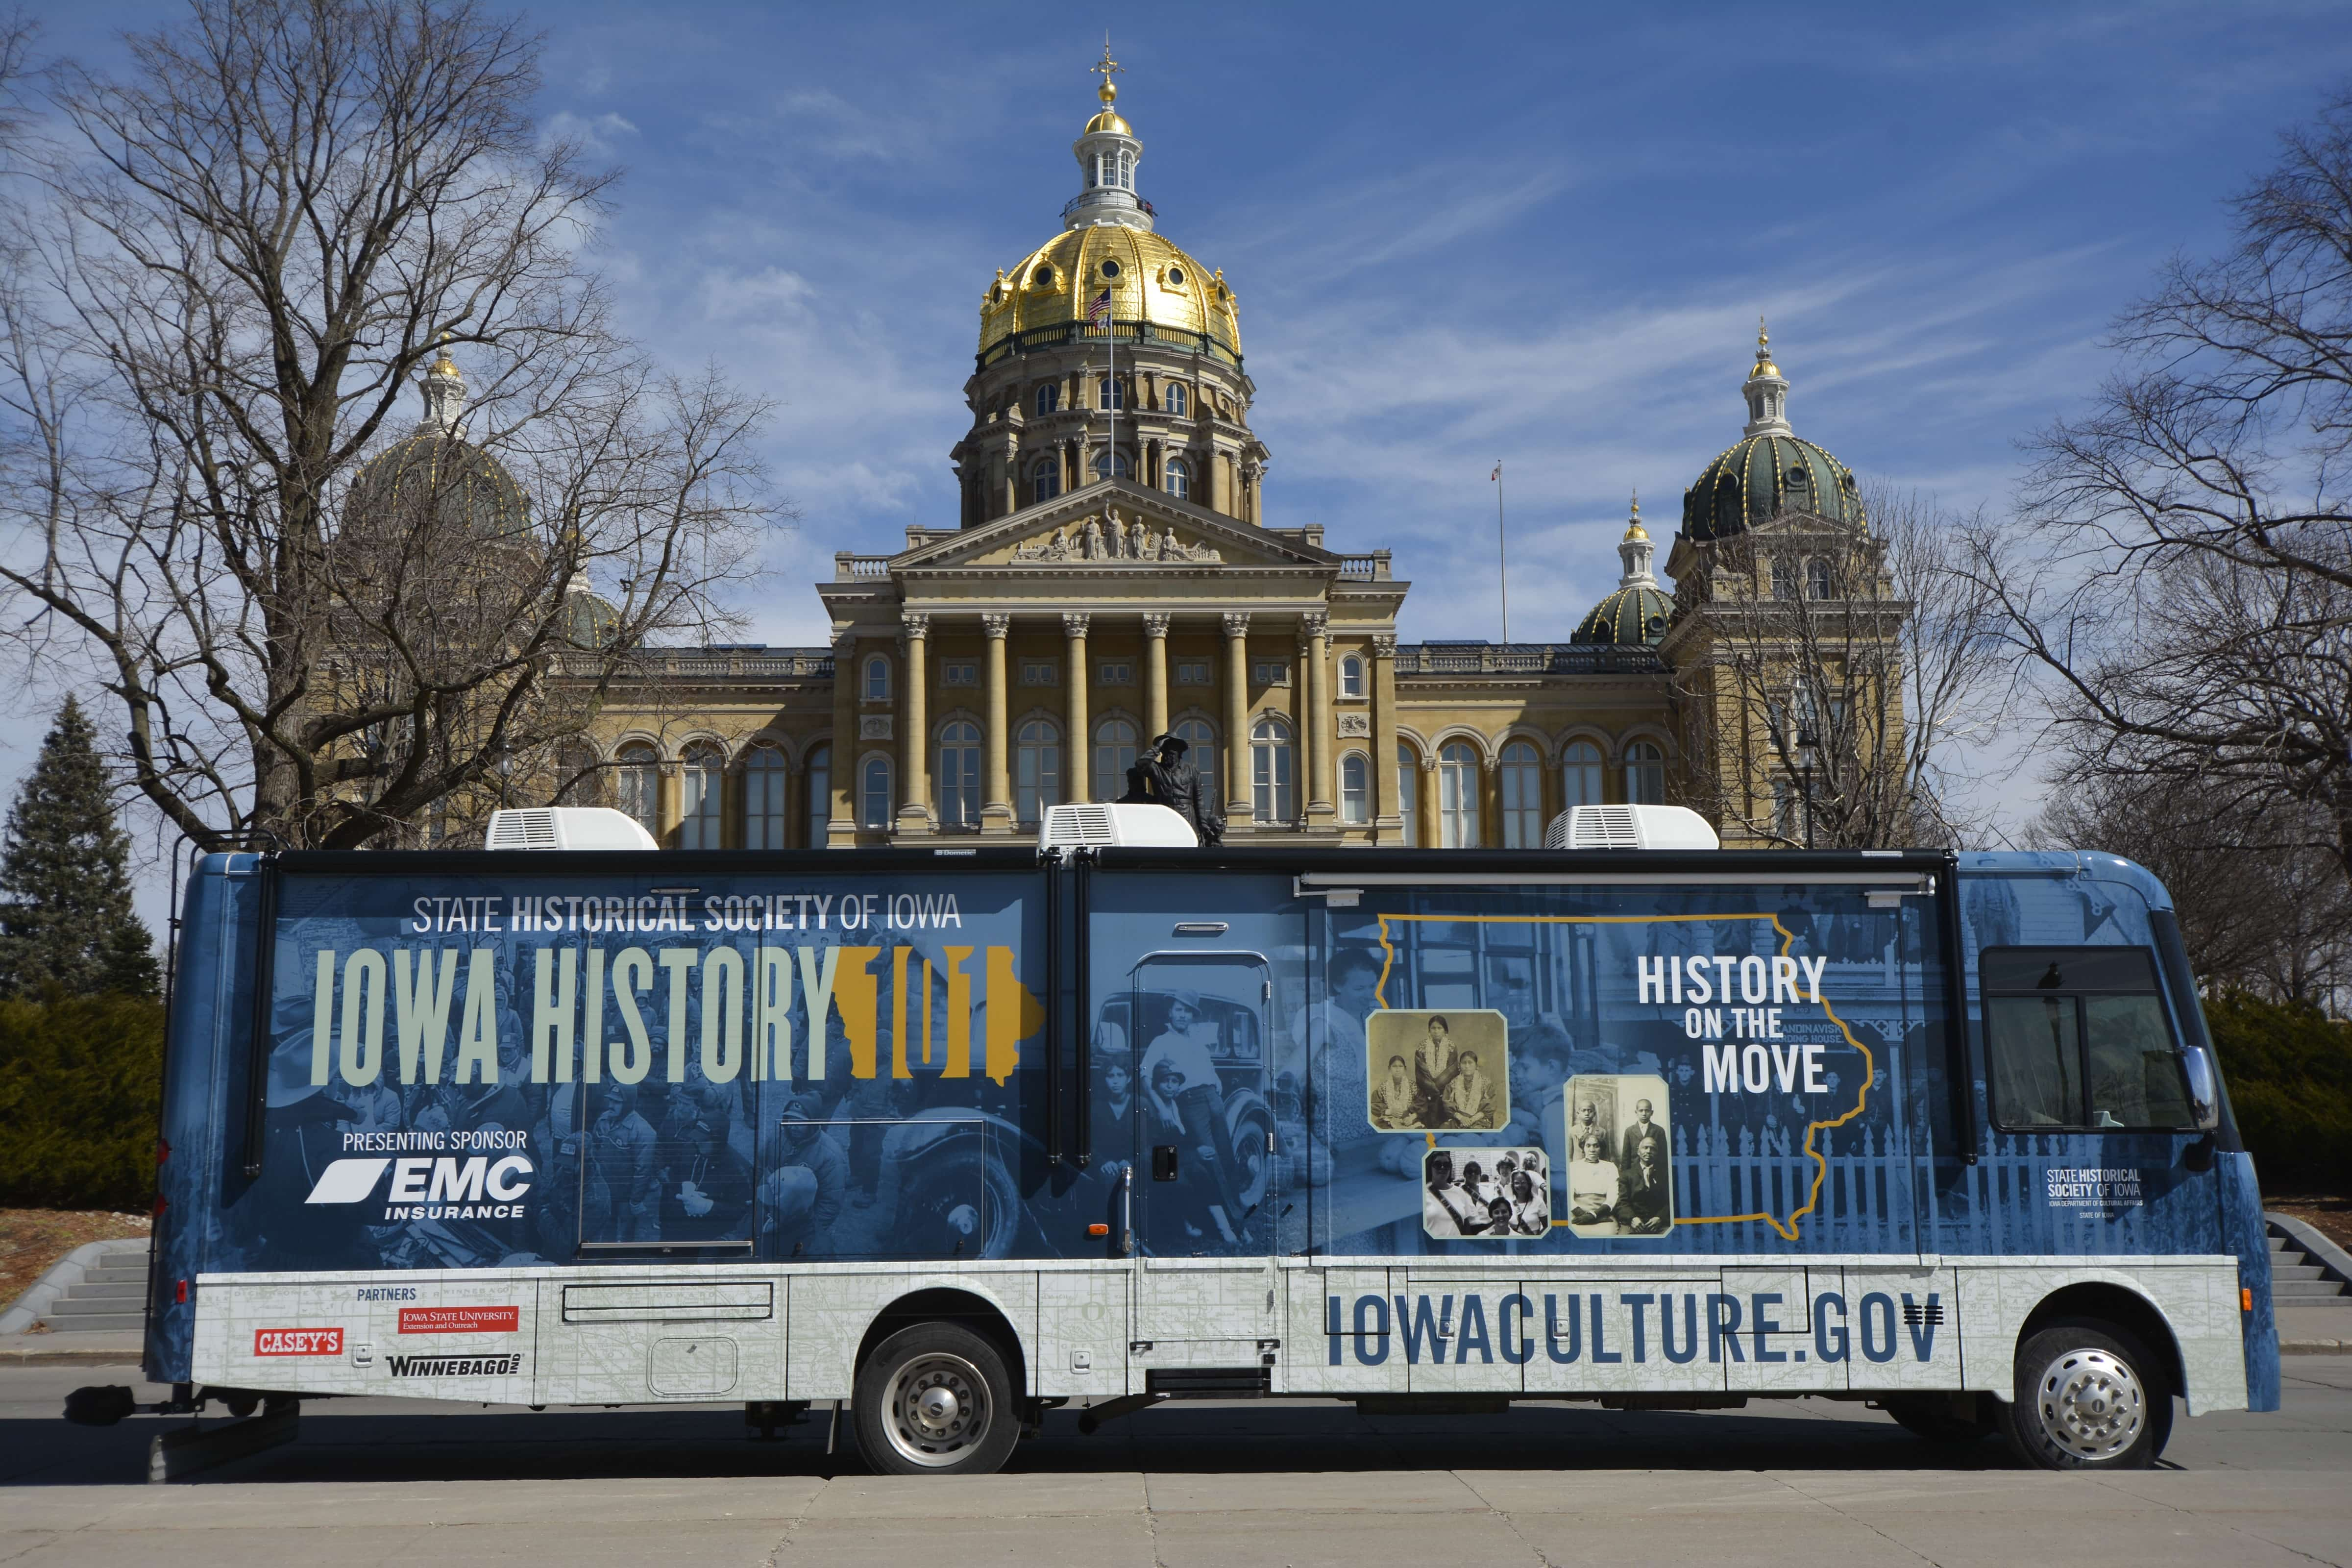 EMC-Sponsored History Exhibition Hits the Road